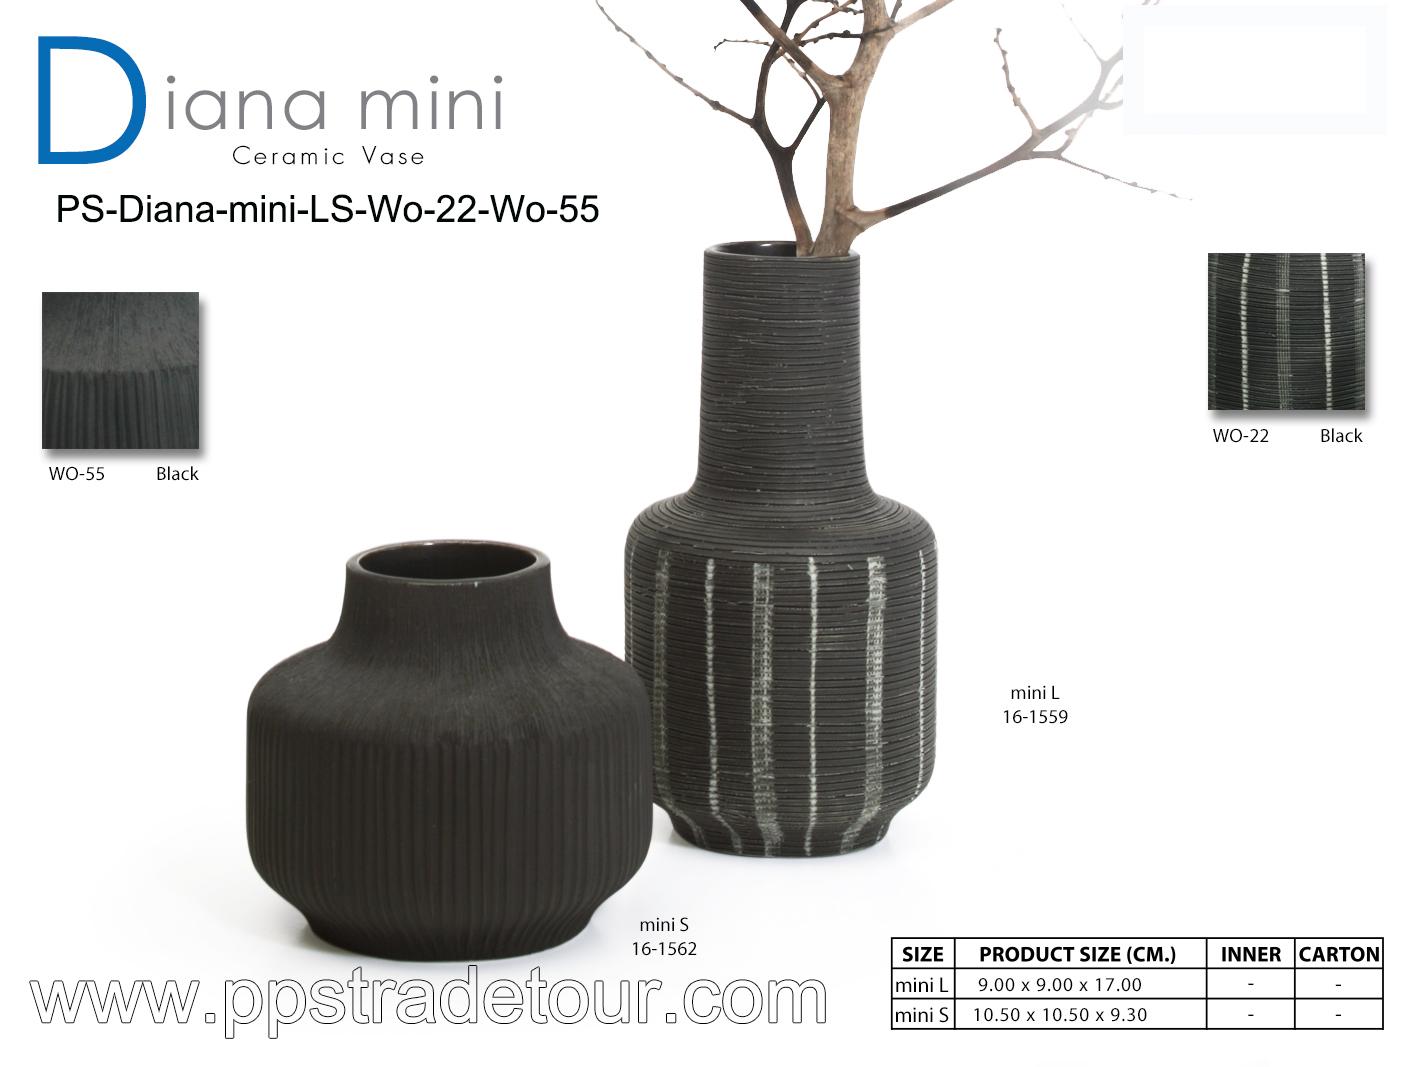 PSCV-Diana-mini-LS-WO-22-WO-55